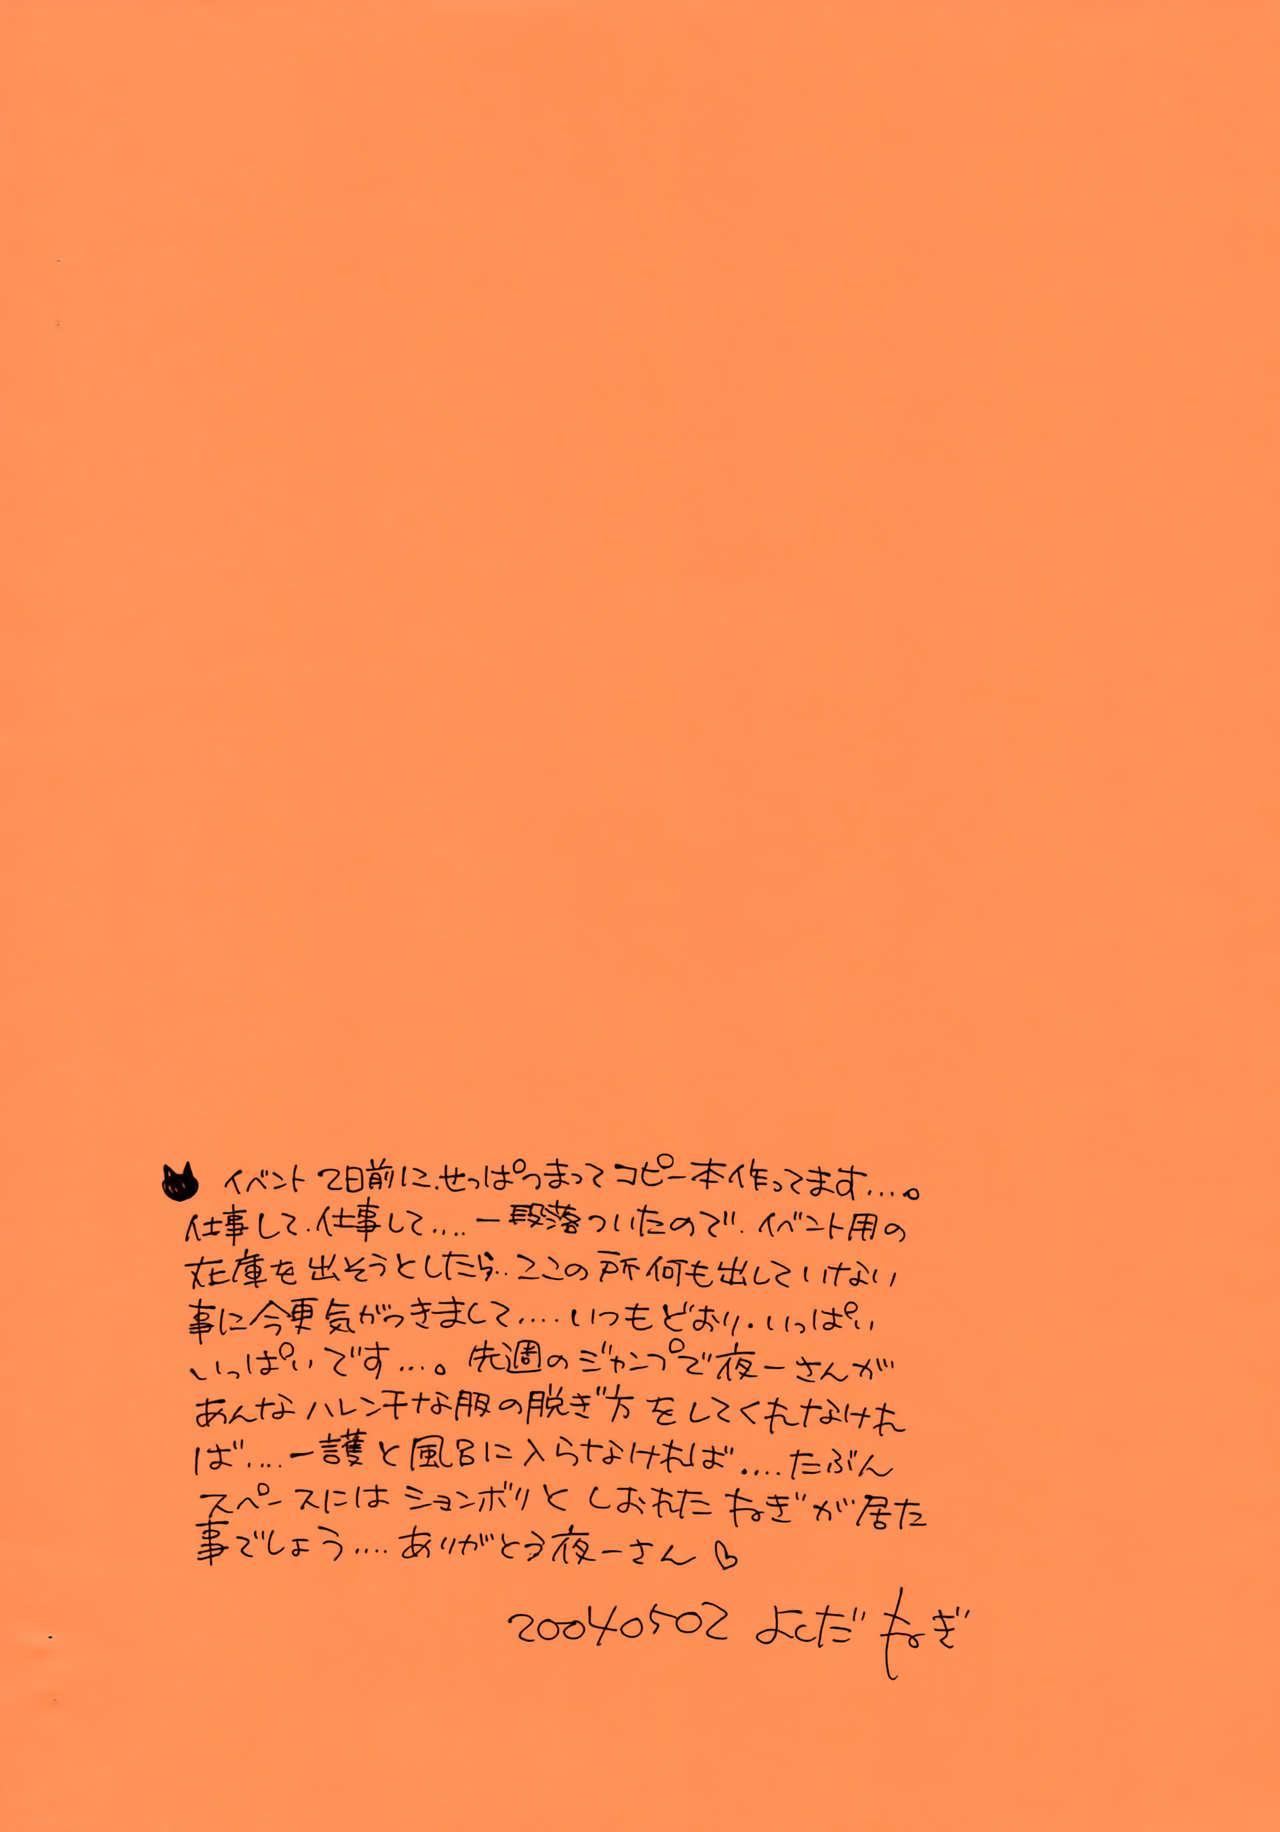 Shunshin Onsen 2